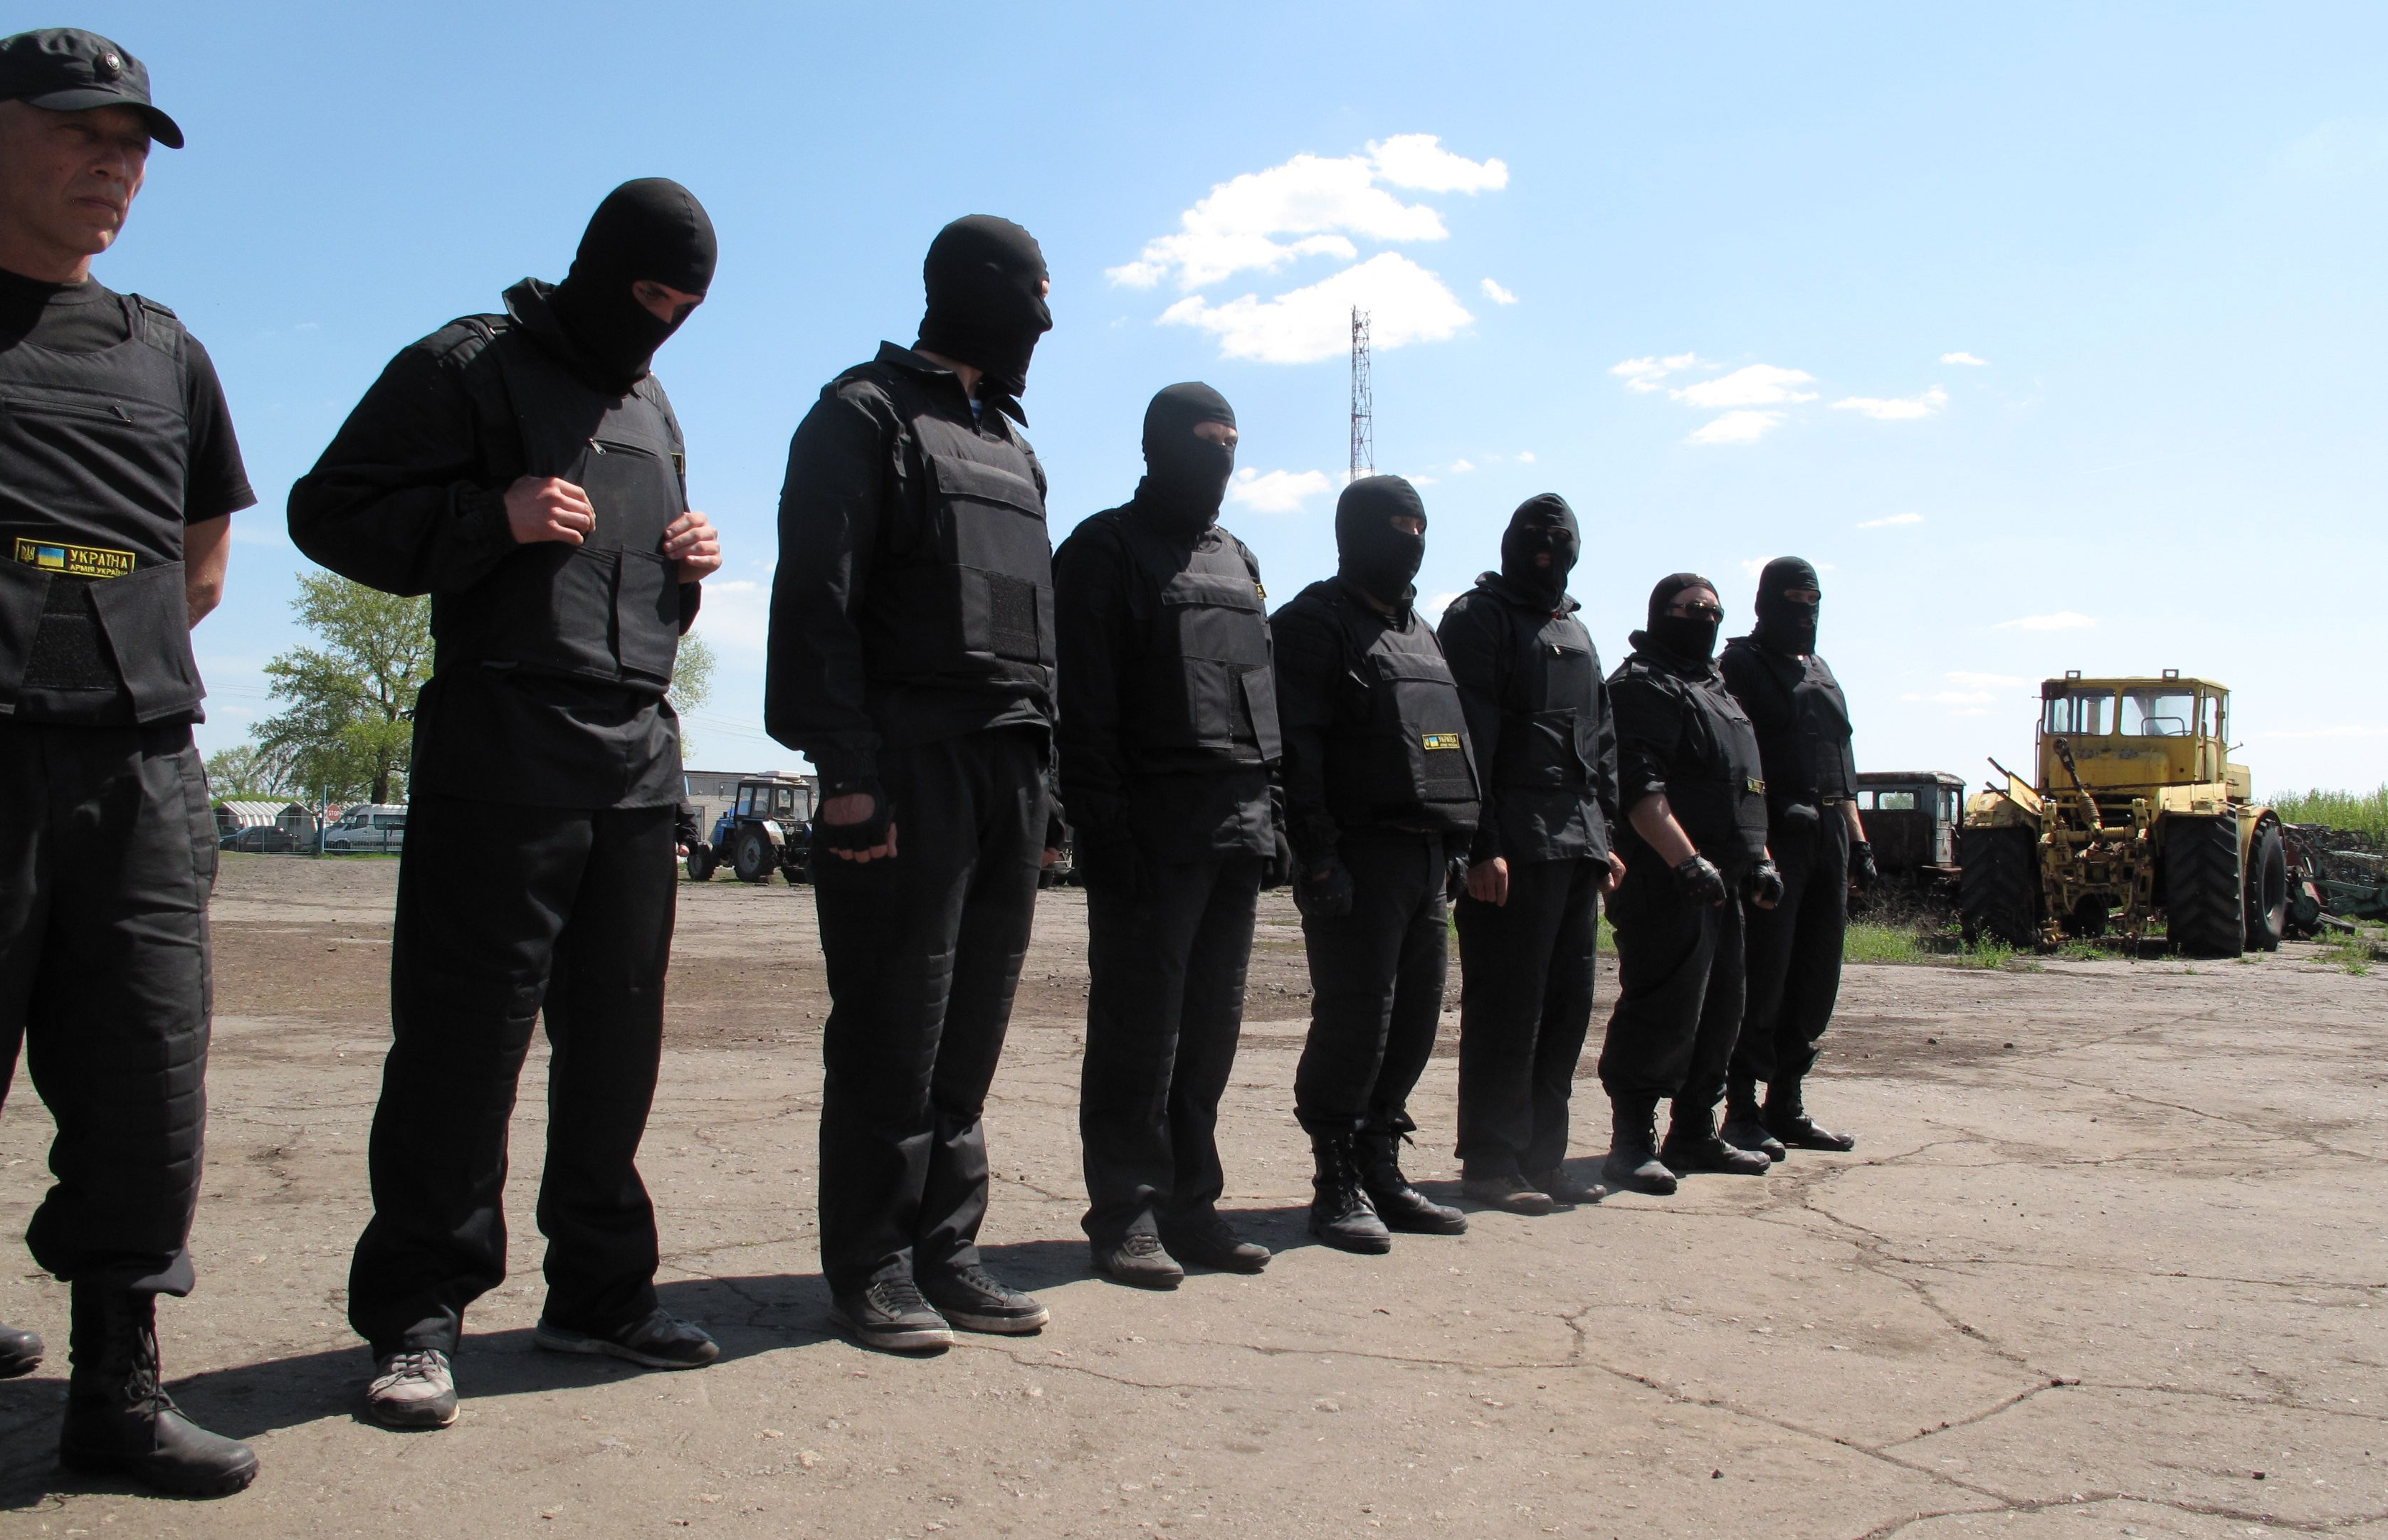 Pro-Ukraine militias are forming to counter the pro-Russia ...